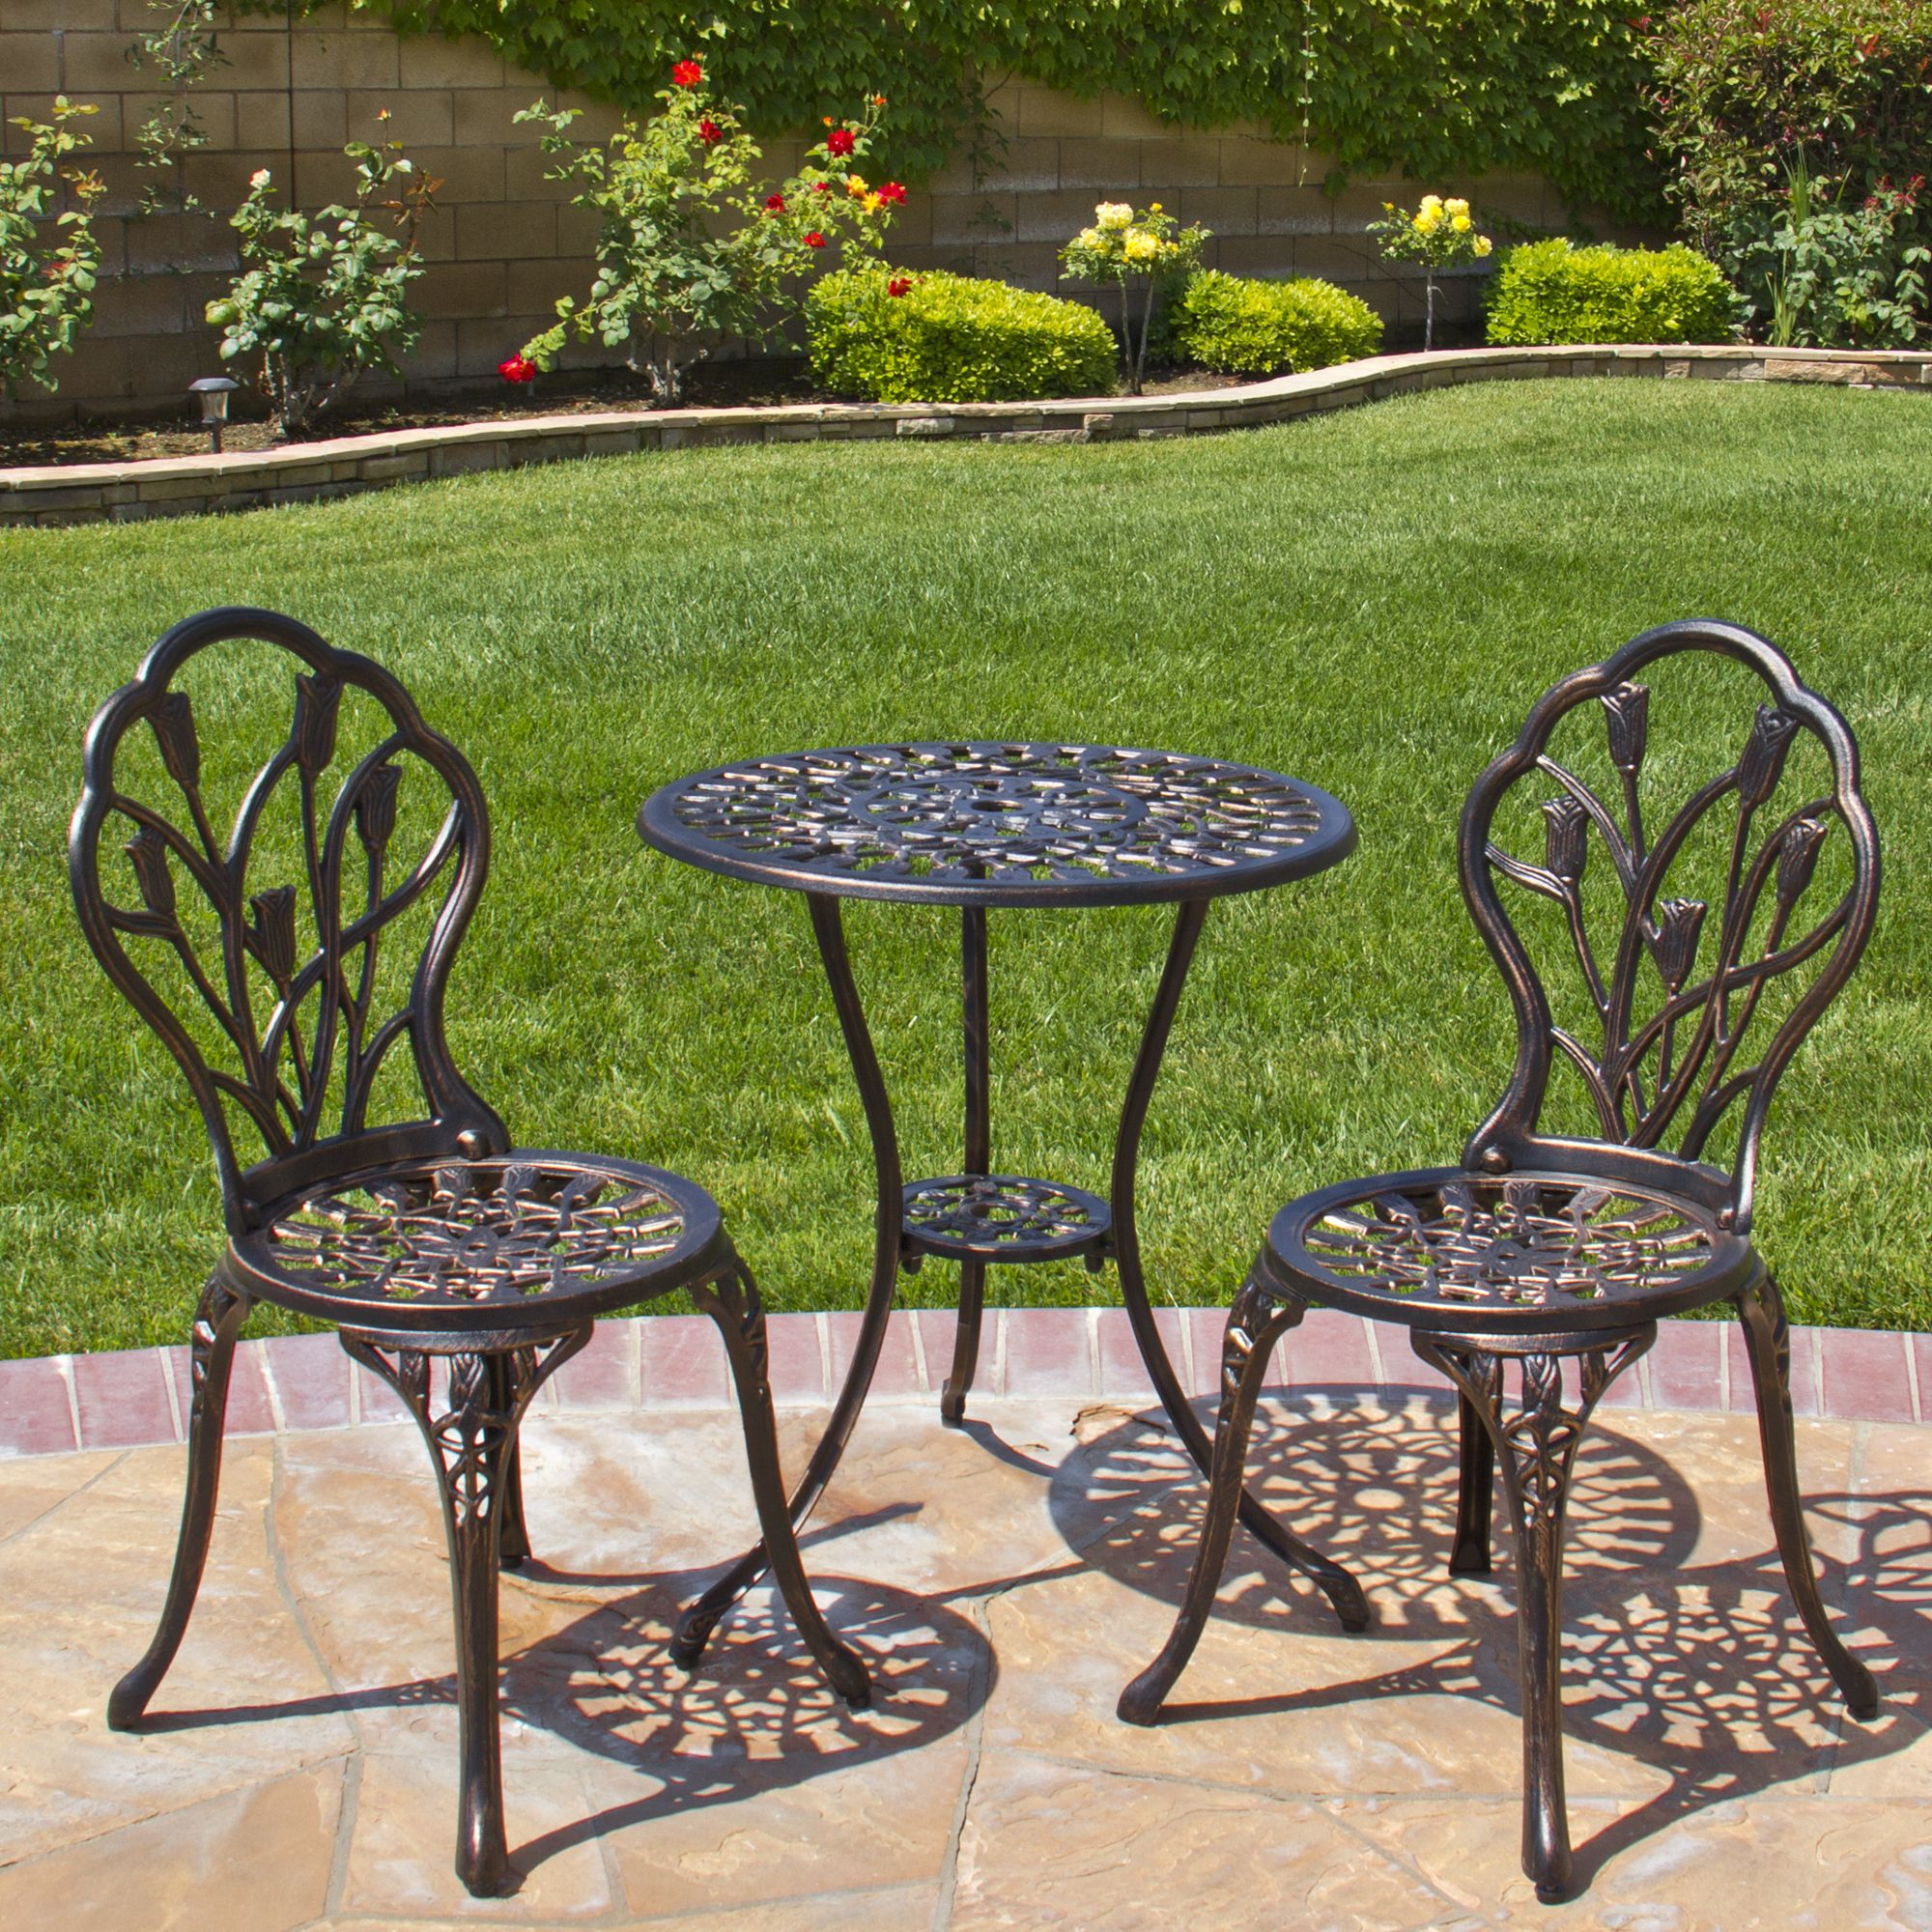 Cast Aluminum Outdoor Furniture Best Choice Products Cast Aluminum Patio Bistro Furniture In 2020 Garden Furniture Sets Outdoor Patio Furniture Sets Outdoor Bistro Set